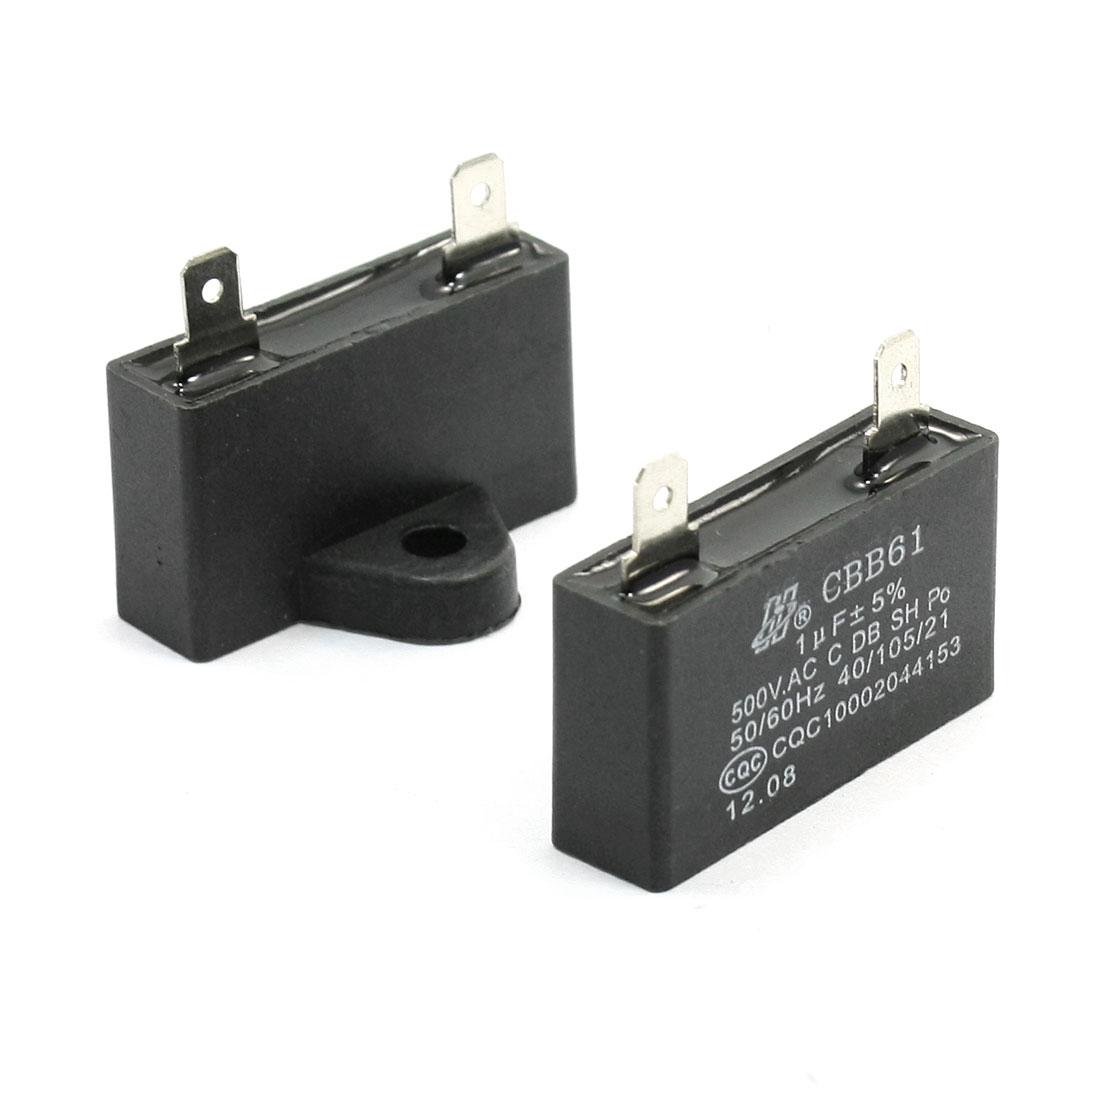 2 Pcs CBB61 2 Terminal Motor Running Capacitor Solder 500VAC 1uF